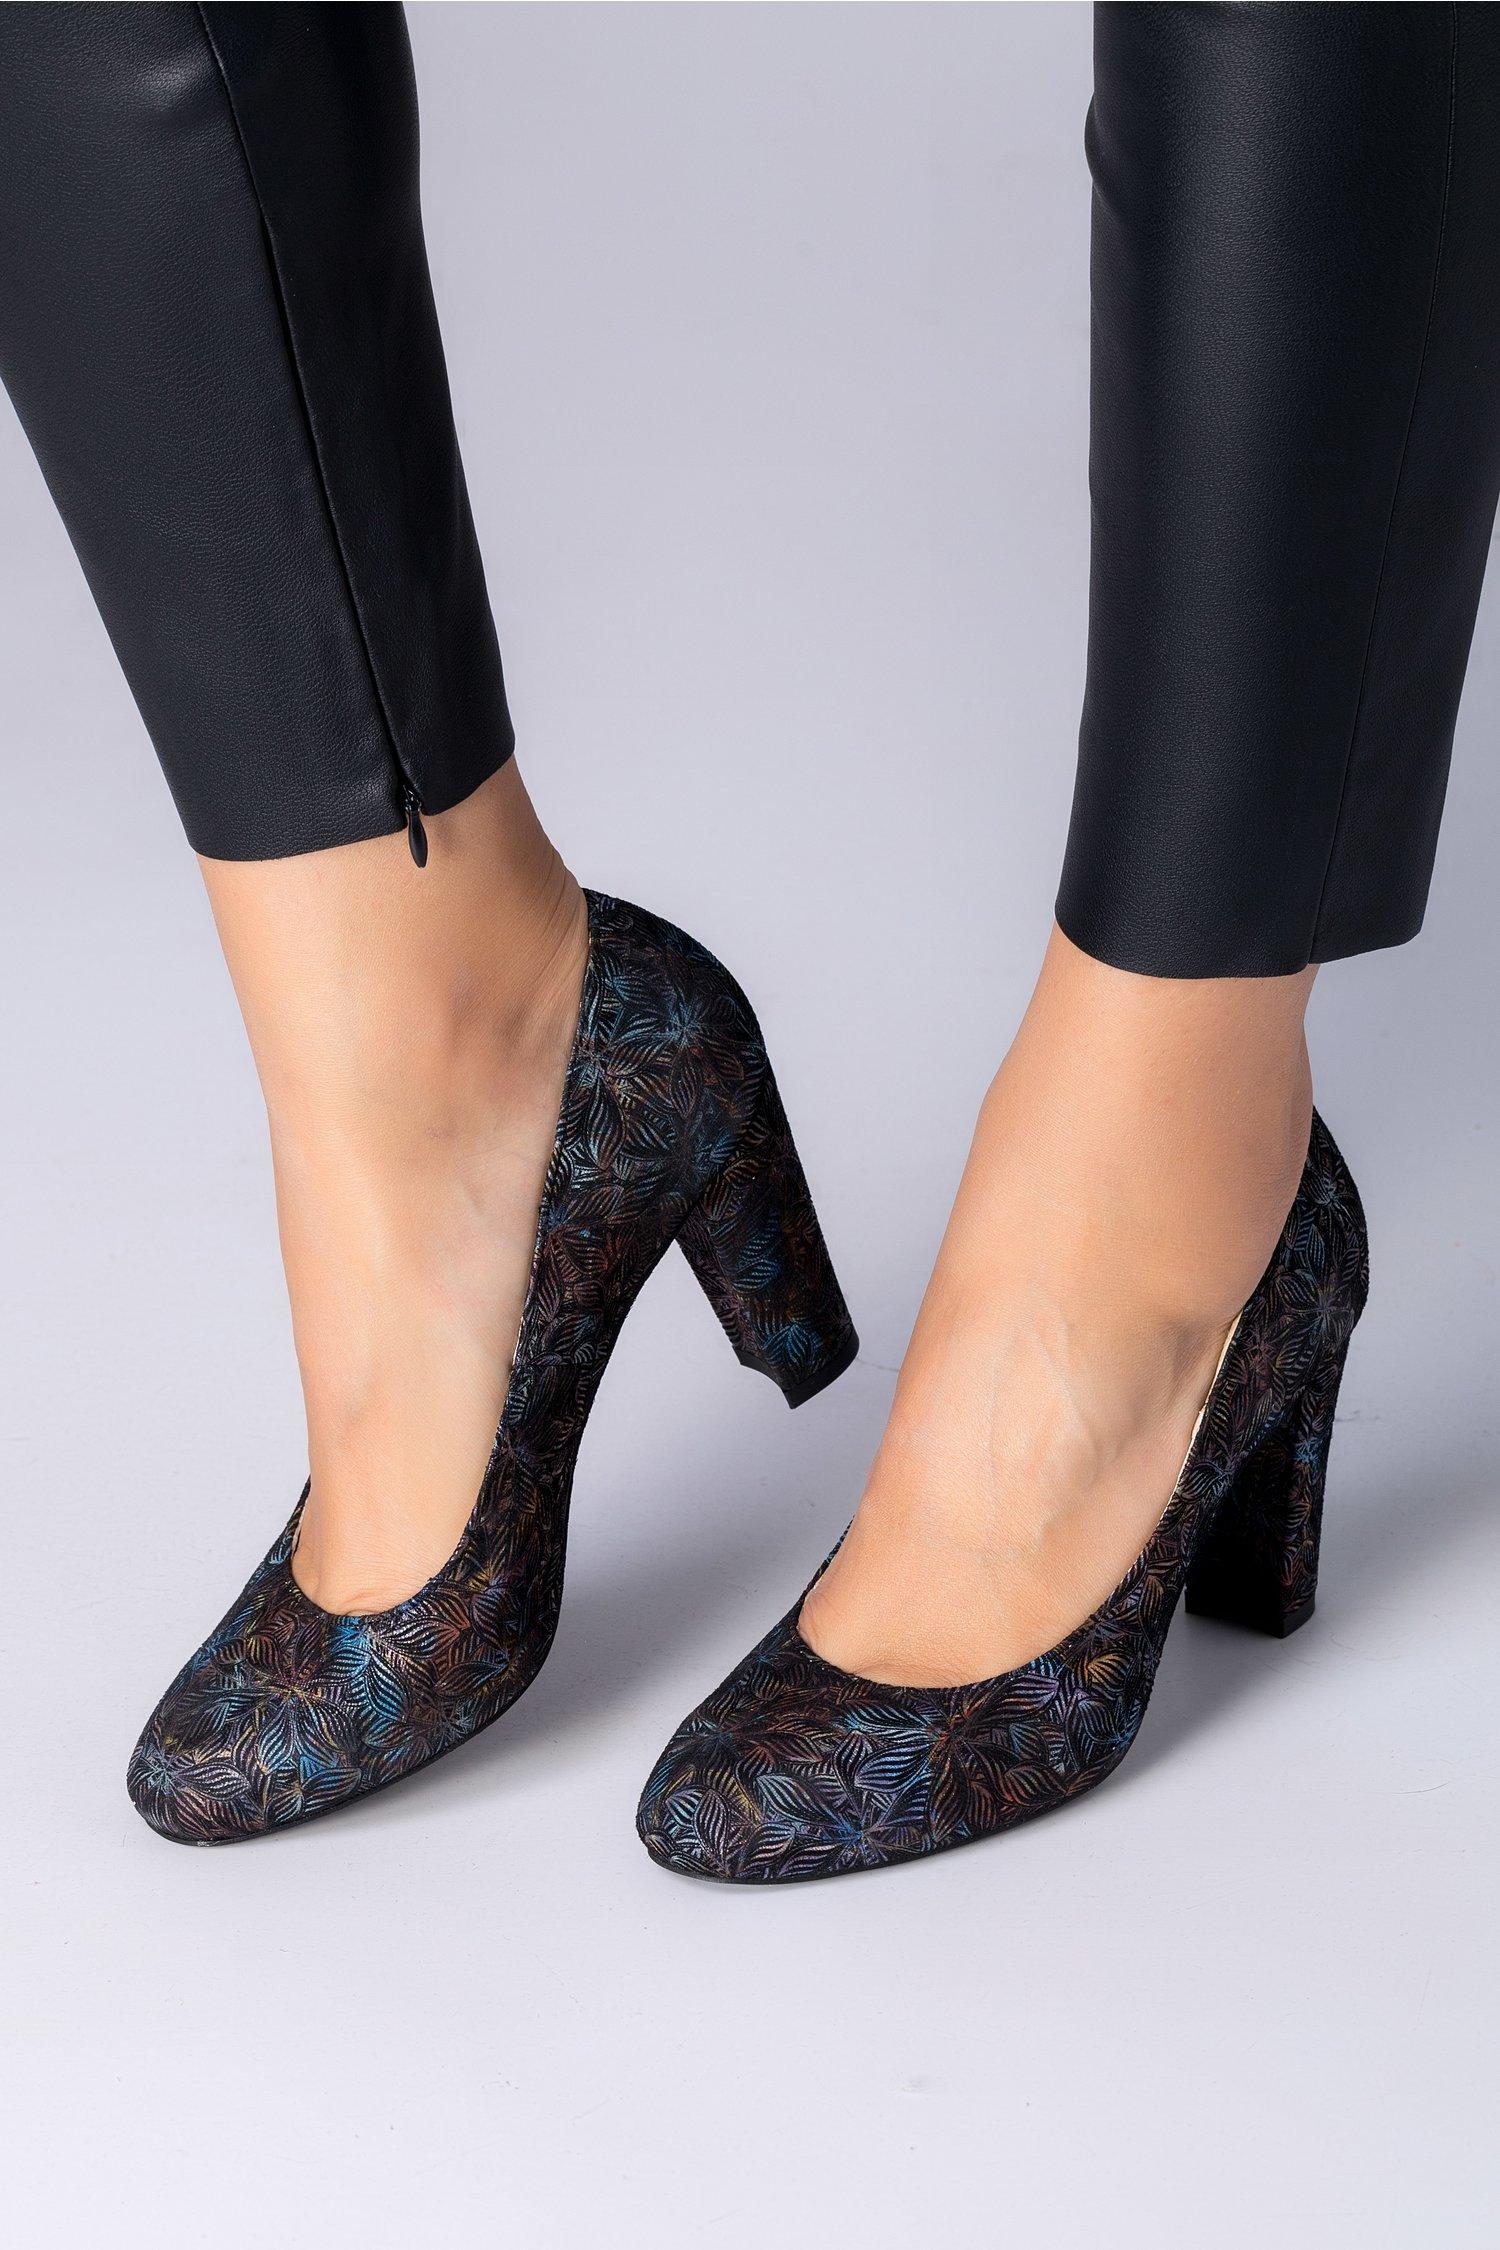 Pantofi Sofia negrii cu motive florale